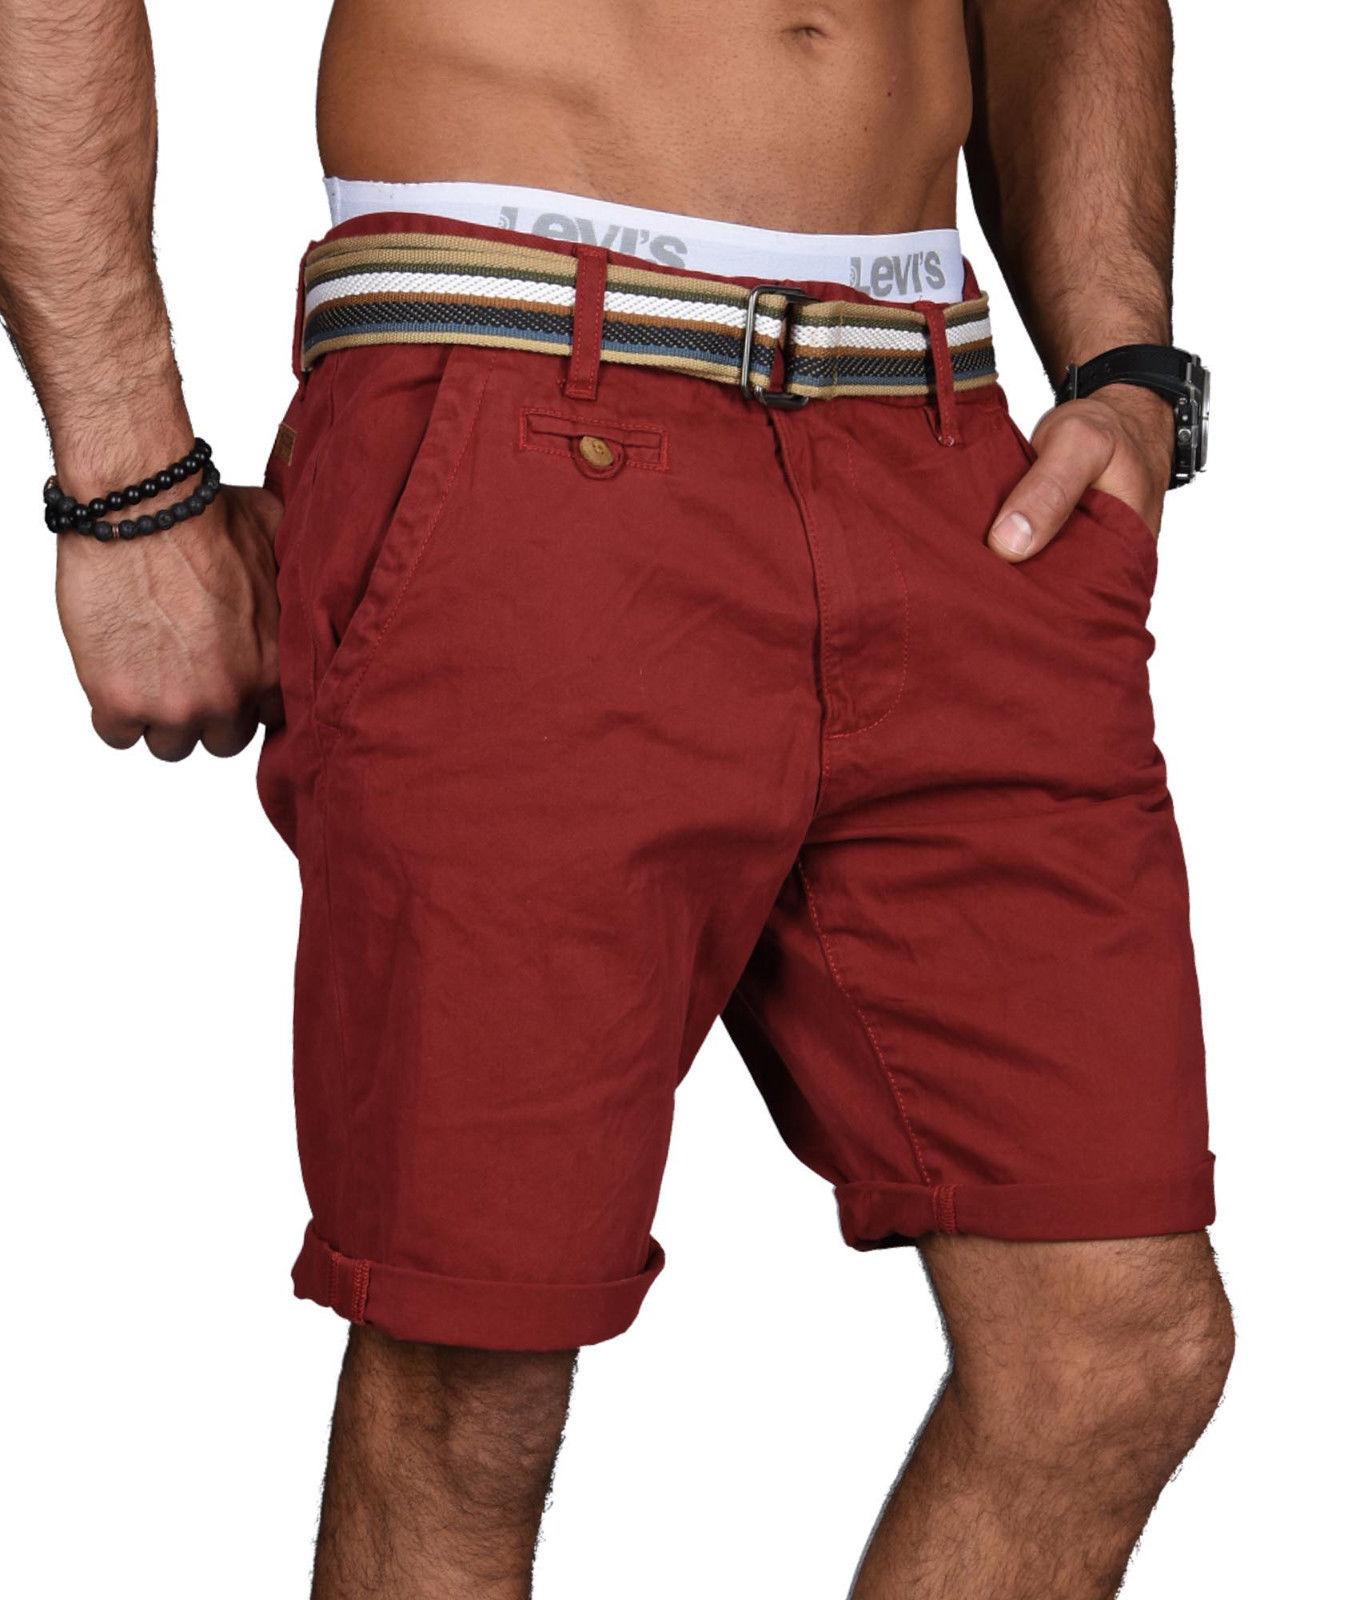 Indicode-Herren-Sommer-Bermuda-Chino-Shorts-kurze-Hose-Sommerhose-Short-NEU-B499 Indexbild 23